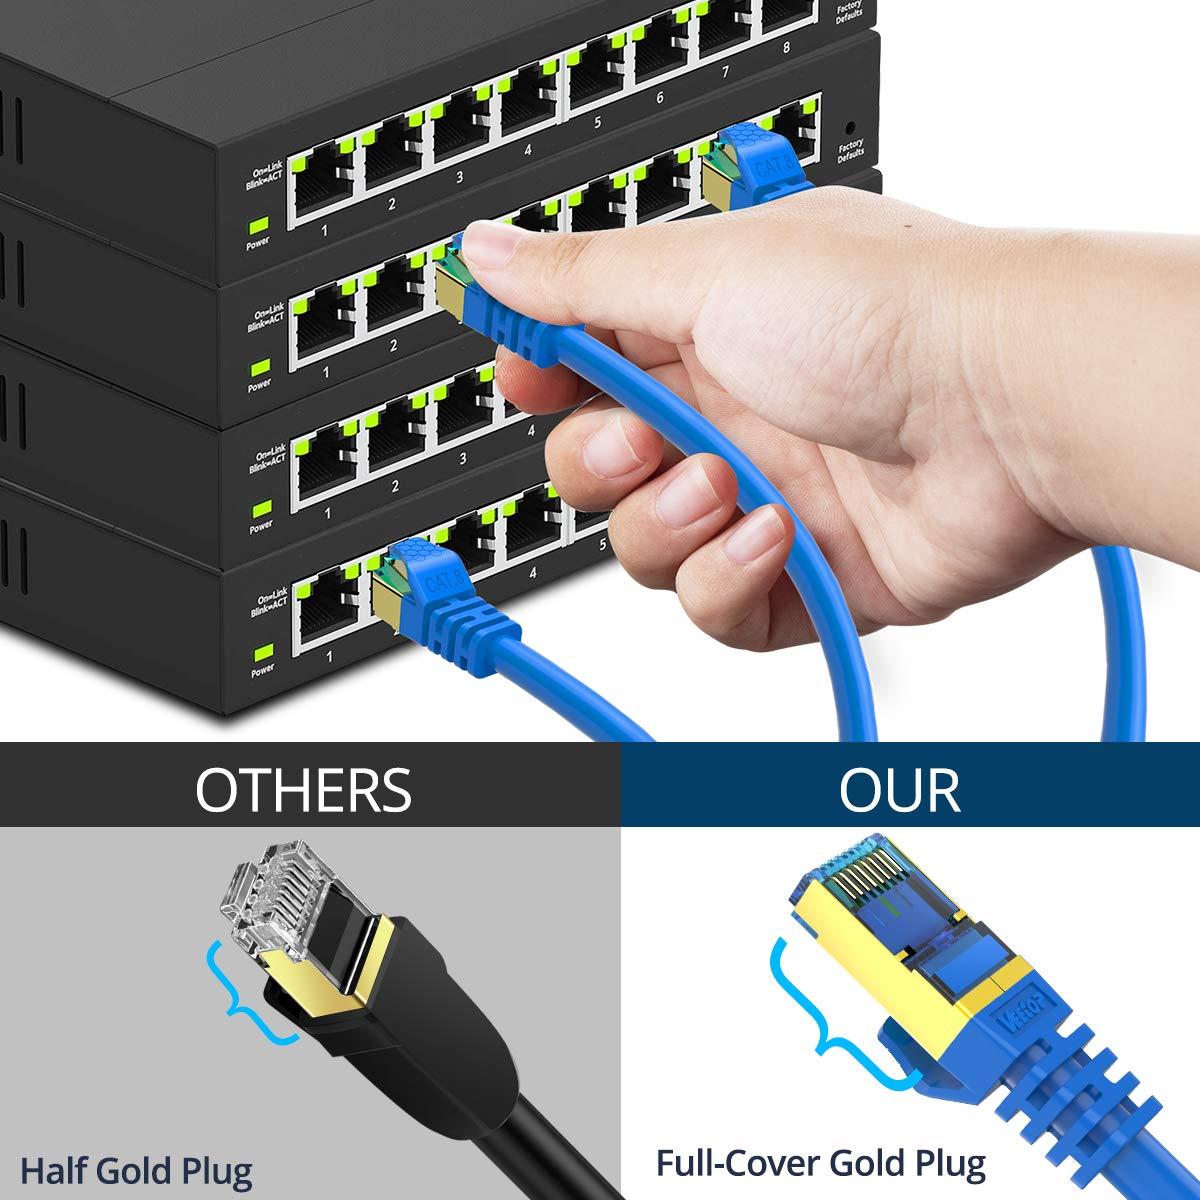 2000Mhz SFTP velocit/à Cavo di Rete 40 Gbps 0,5m Blu Veetop Cavo Ethernet LAN Cat 8 RJ45